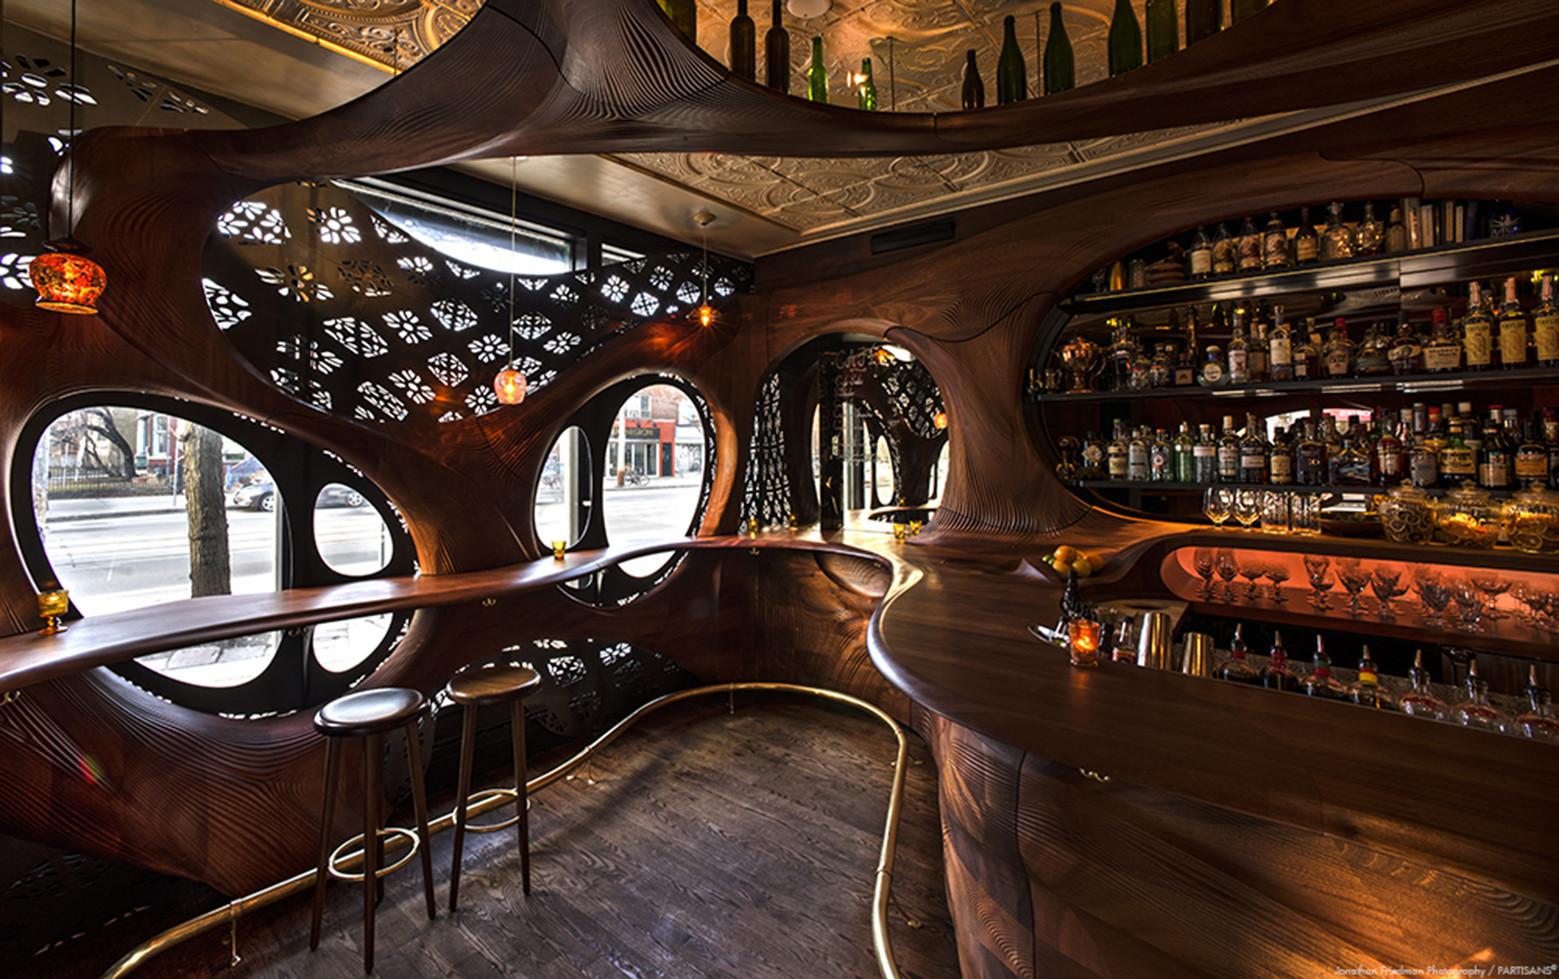 living room mini bar furniture design best arrangement for long narrow gallery of raval / partisans - 4